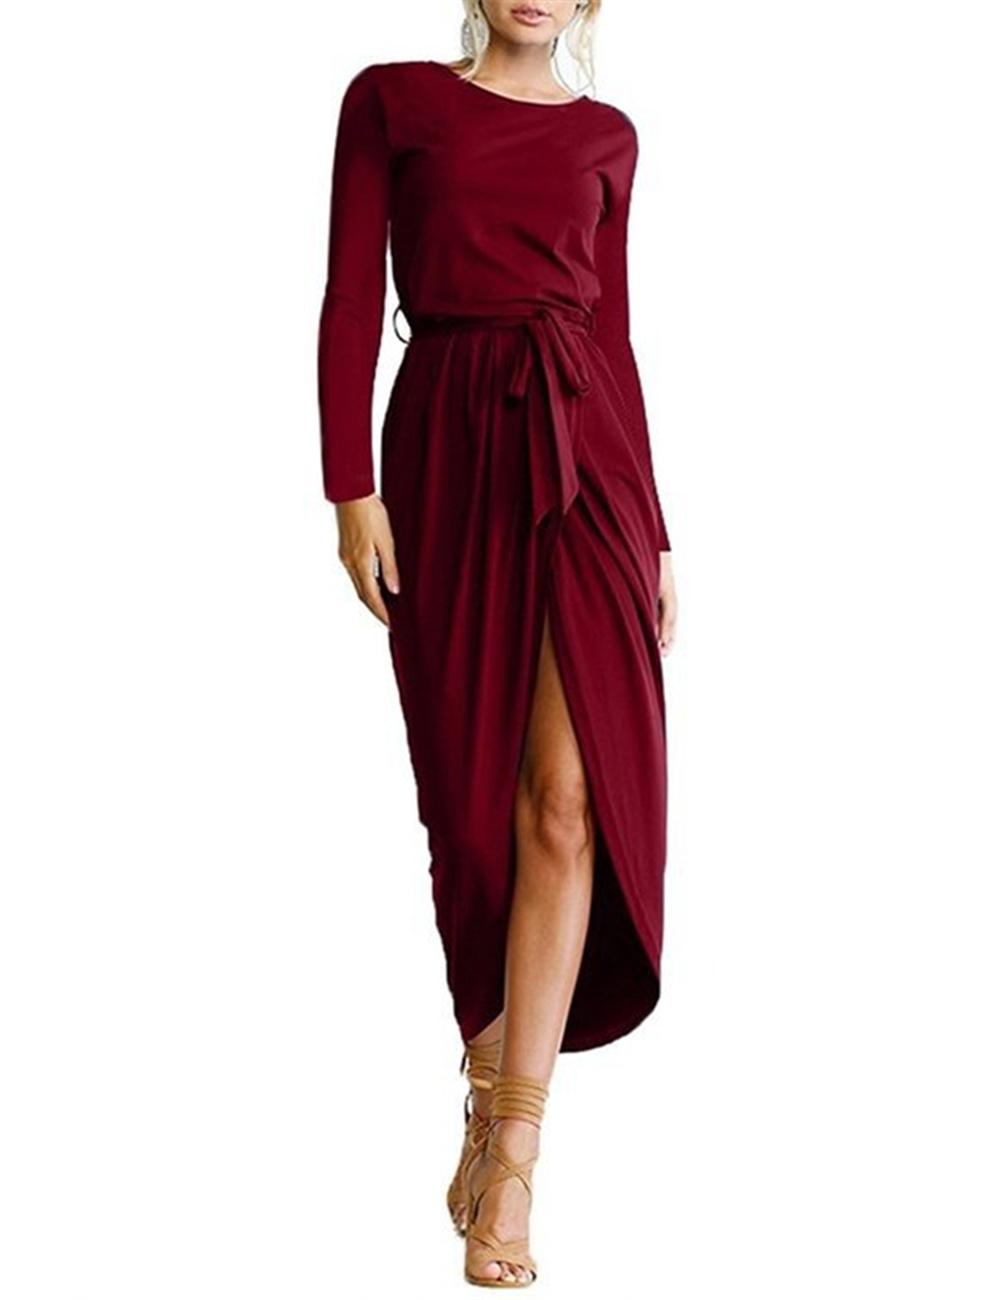 Women Fashionable Slim Design Sexy Dress Round Collar Long Sleeve Split Irregularity Dress with Belt